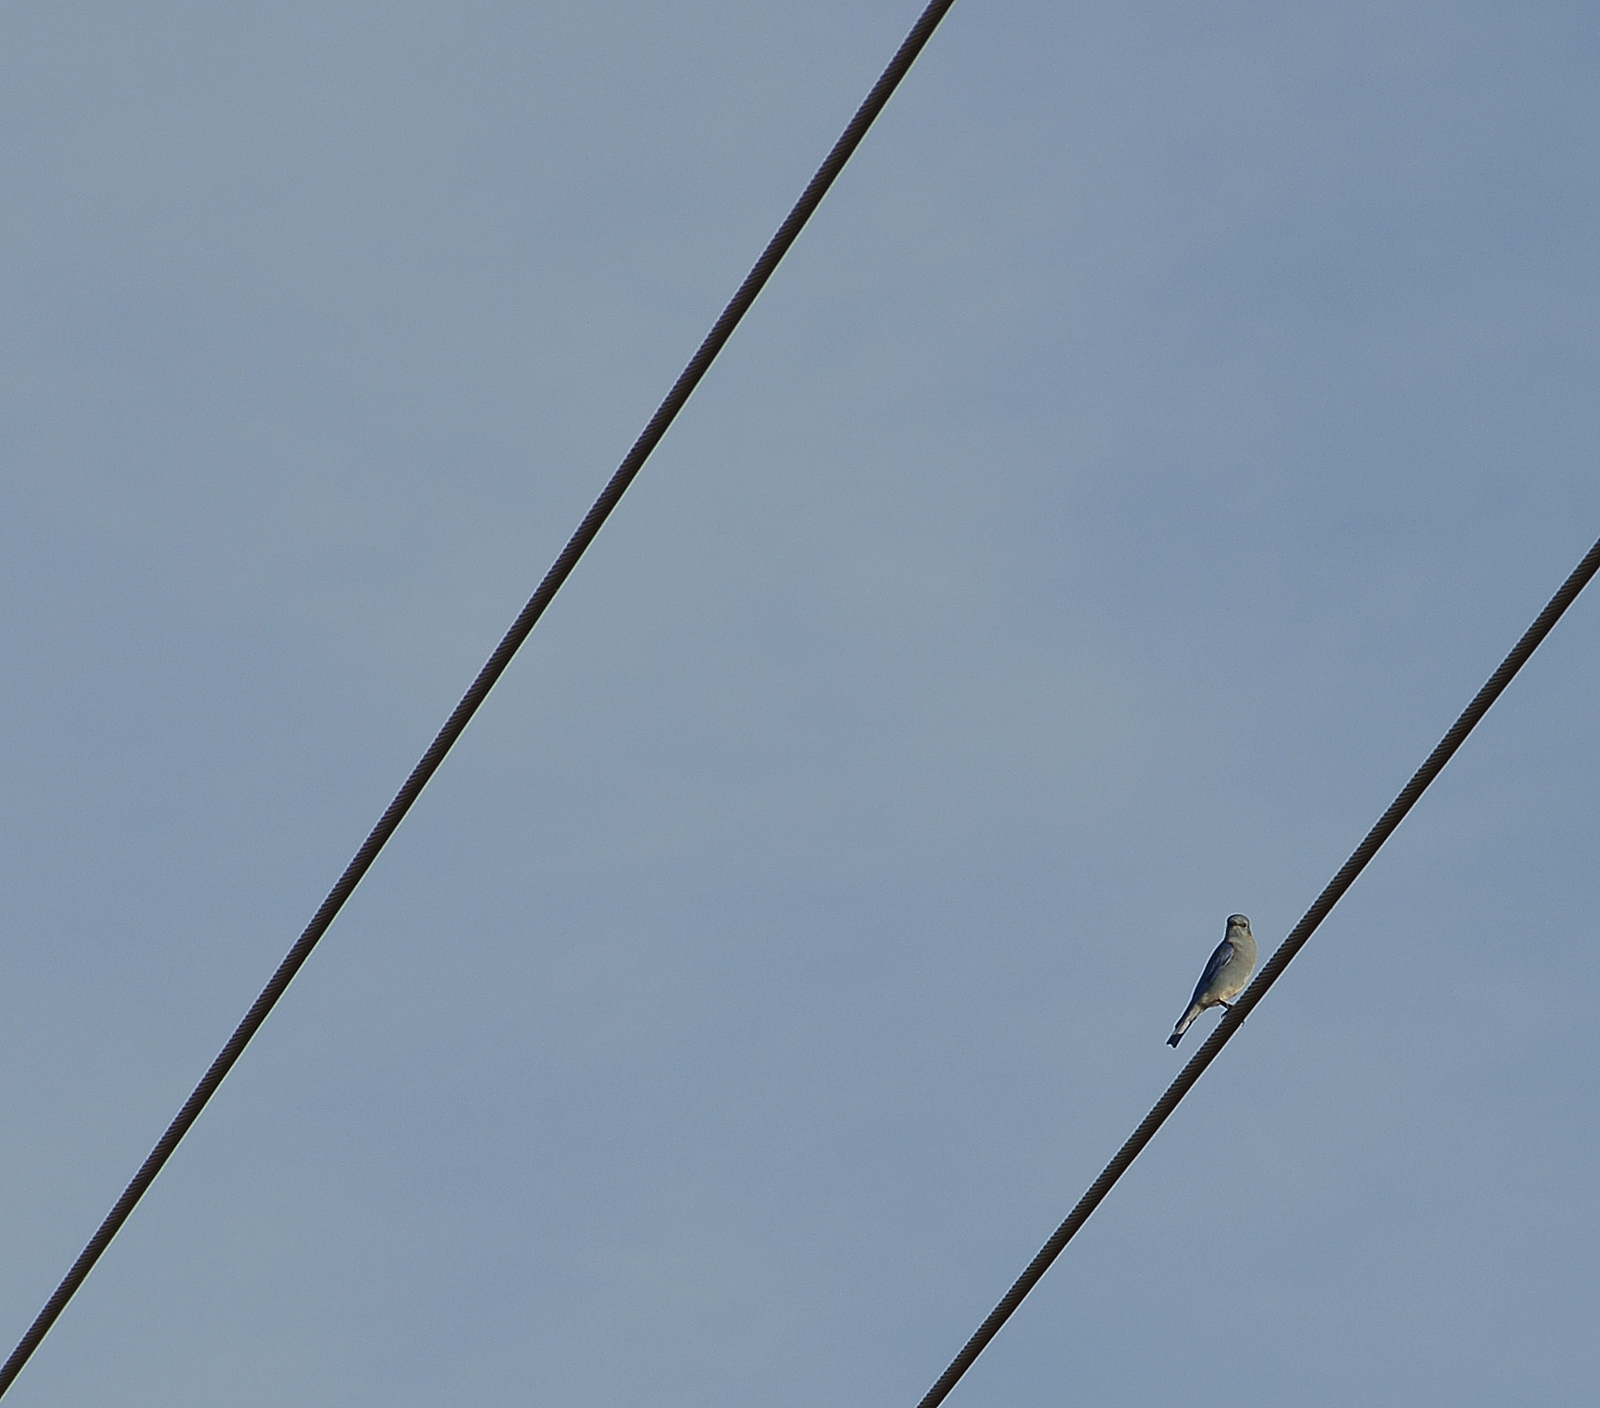 Blue bird on a wire photo